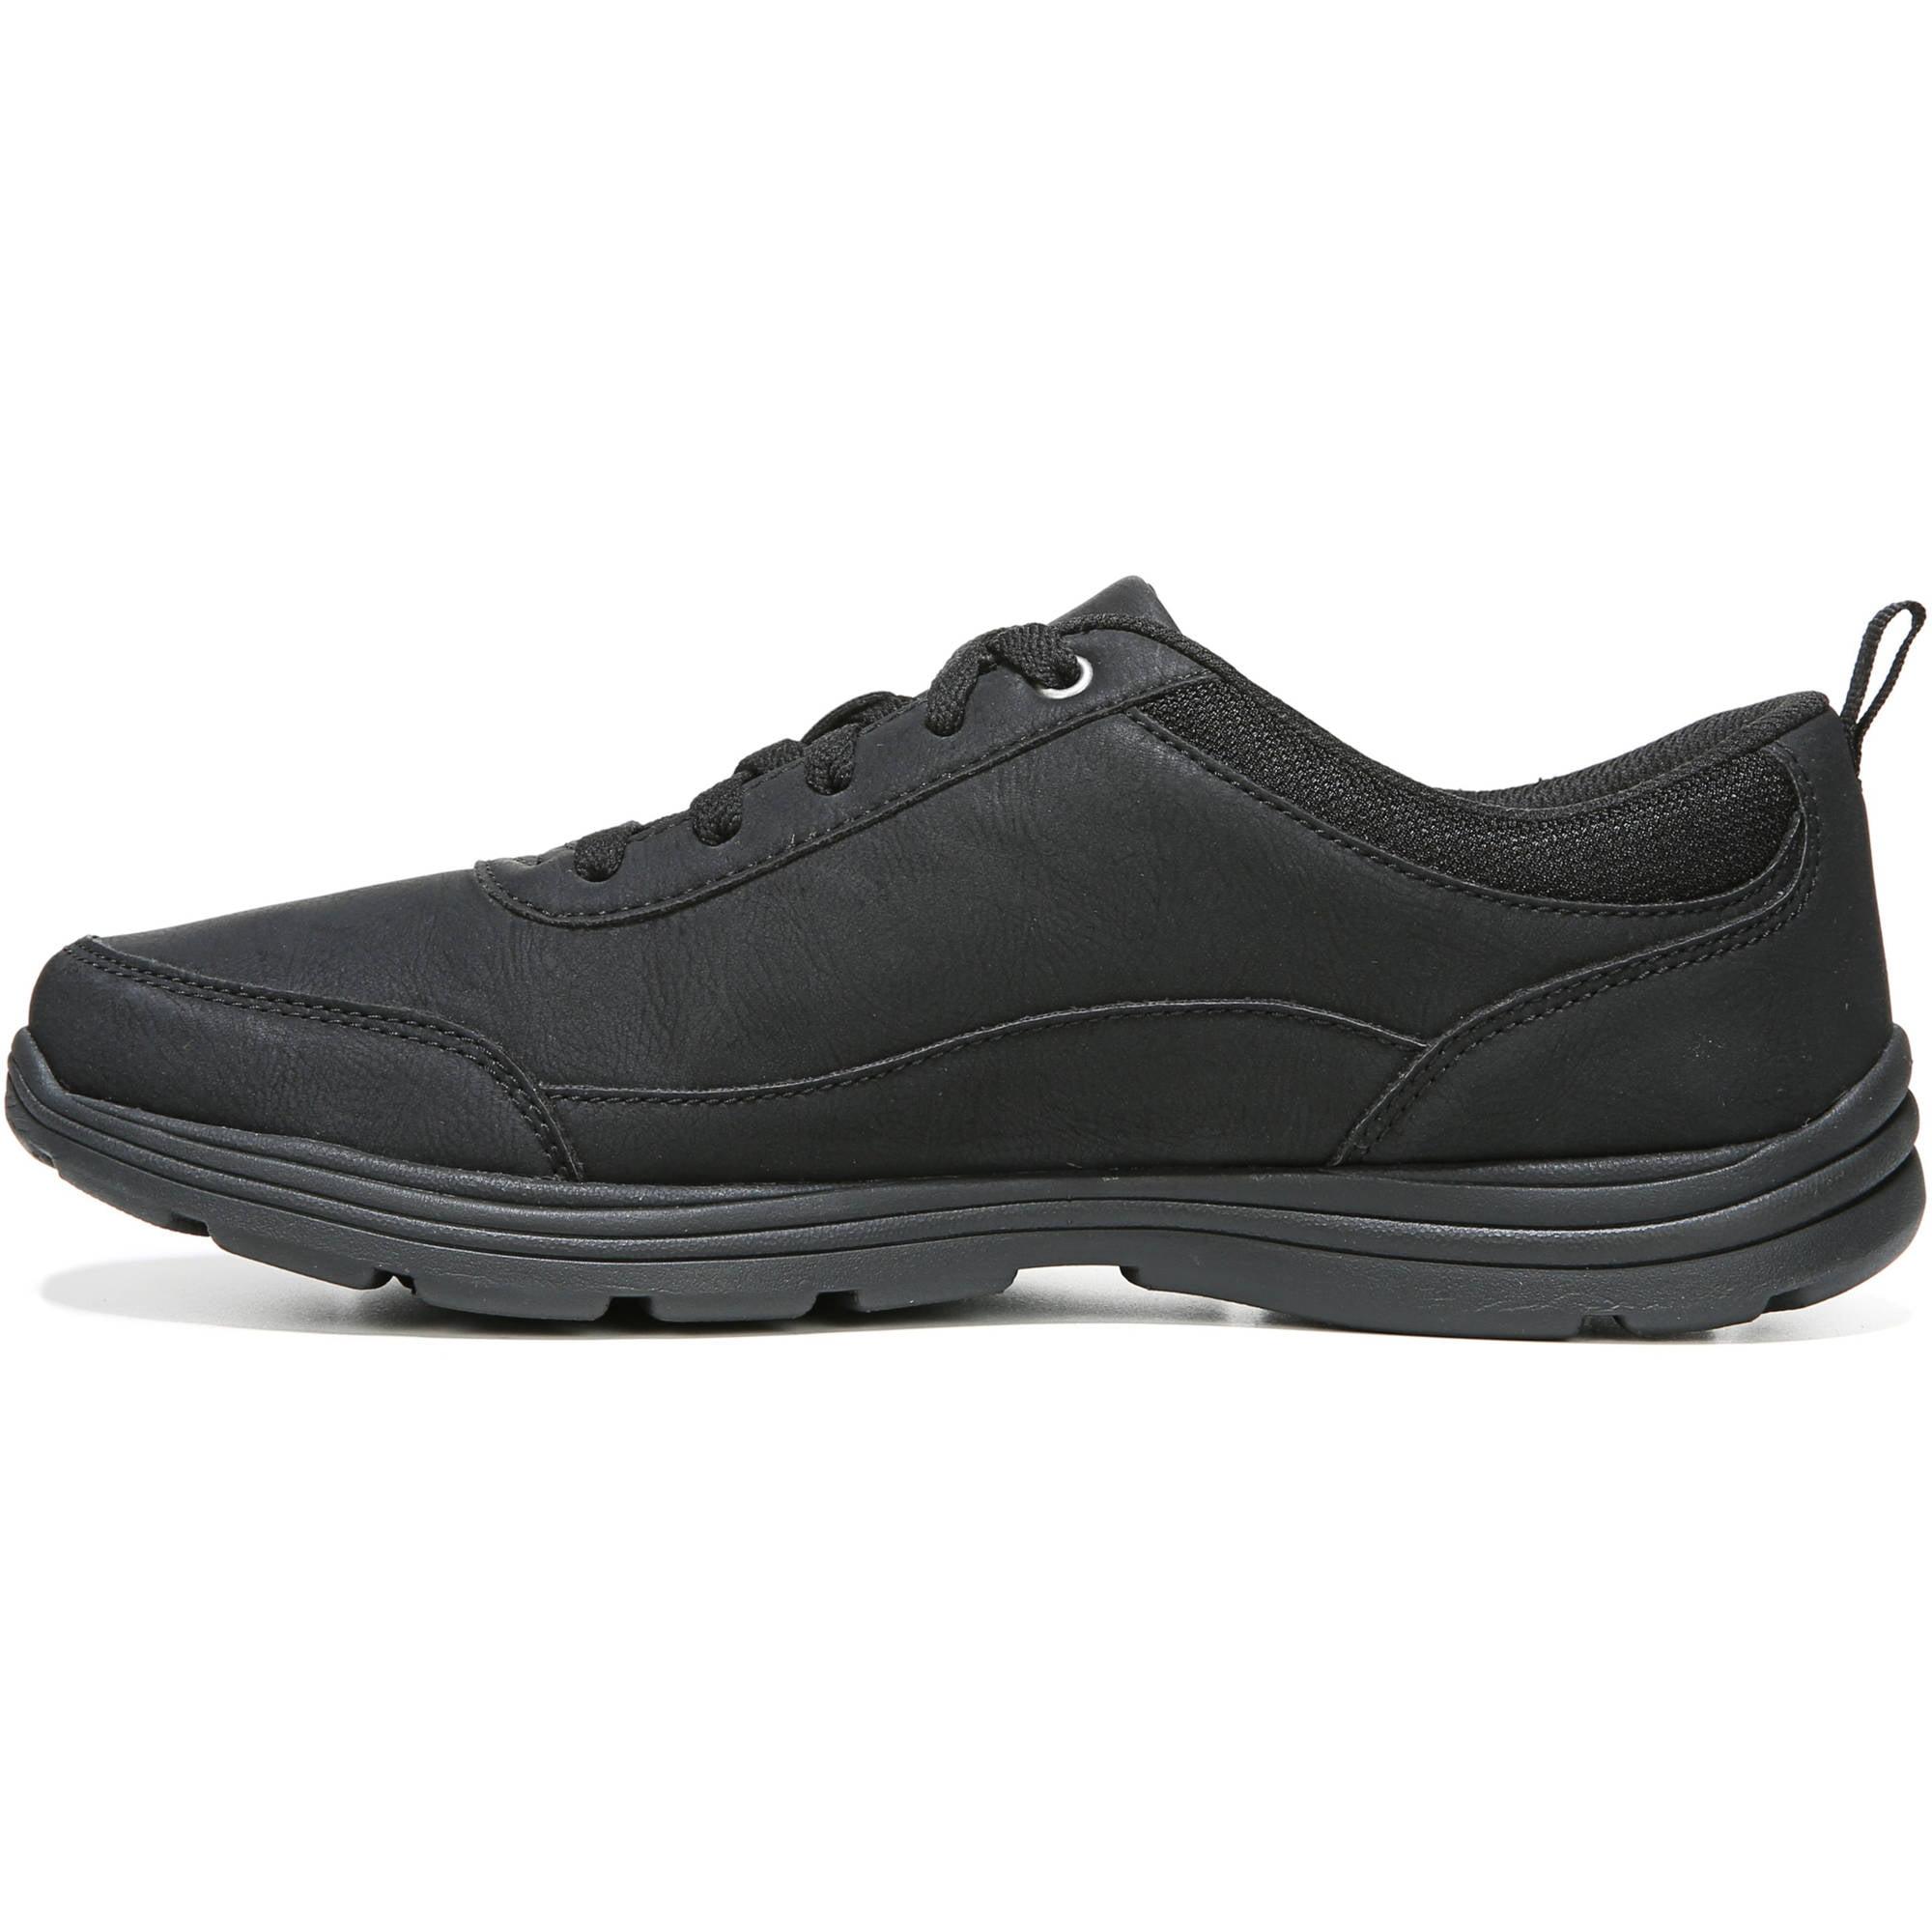 Dr Scholls Womens Dress Shoes